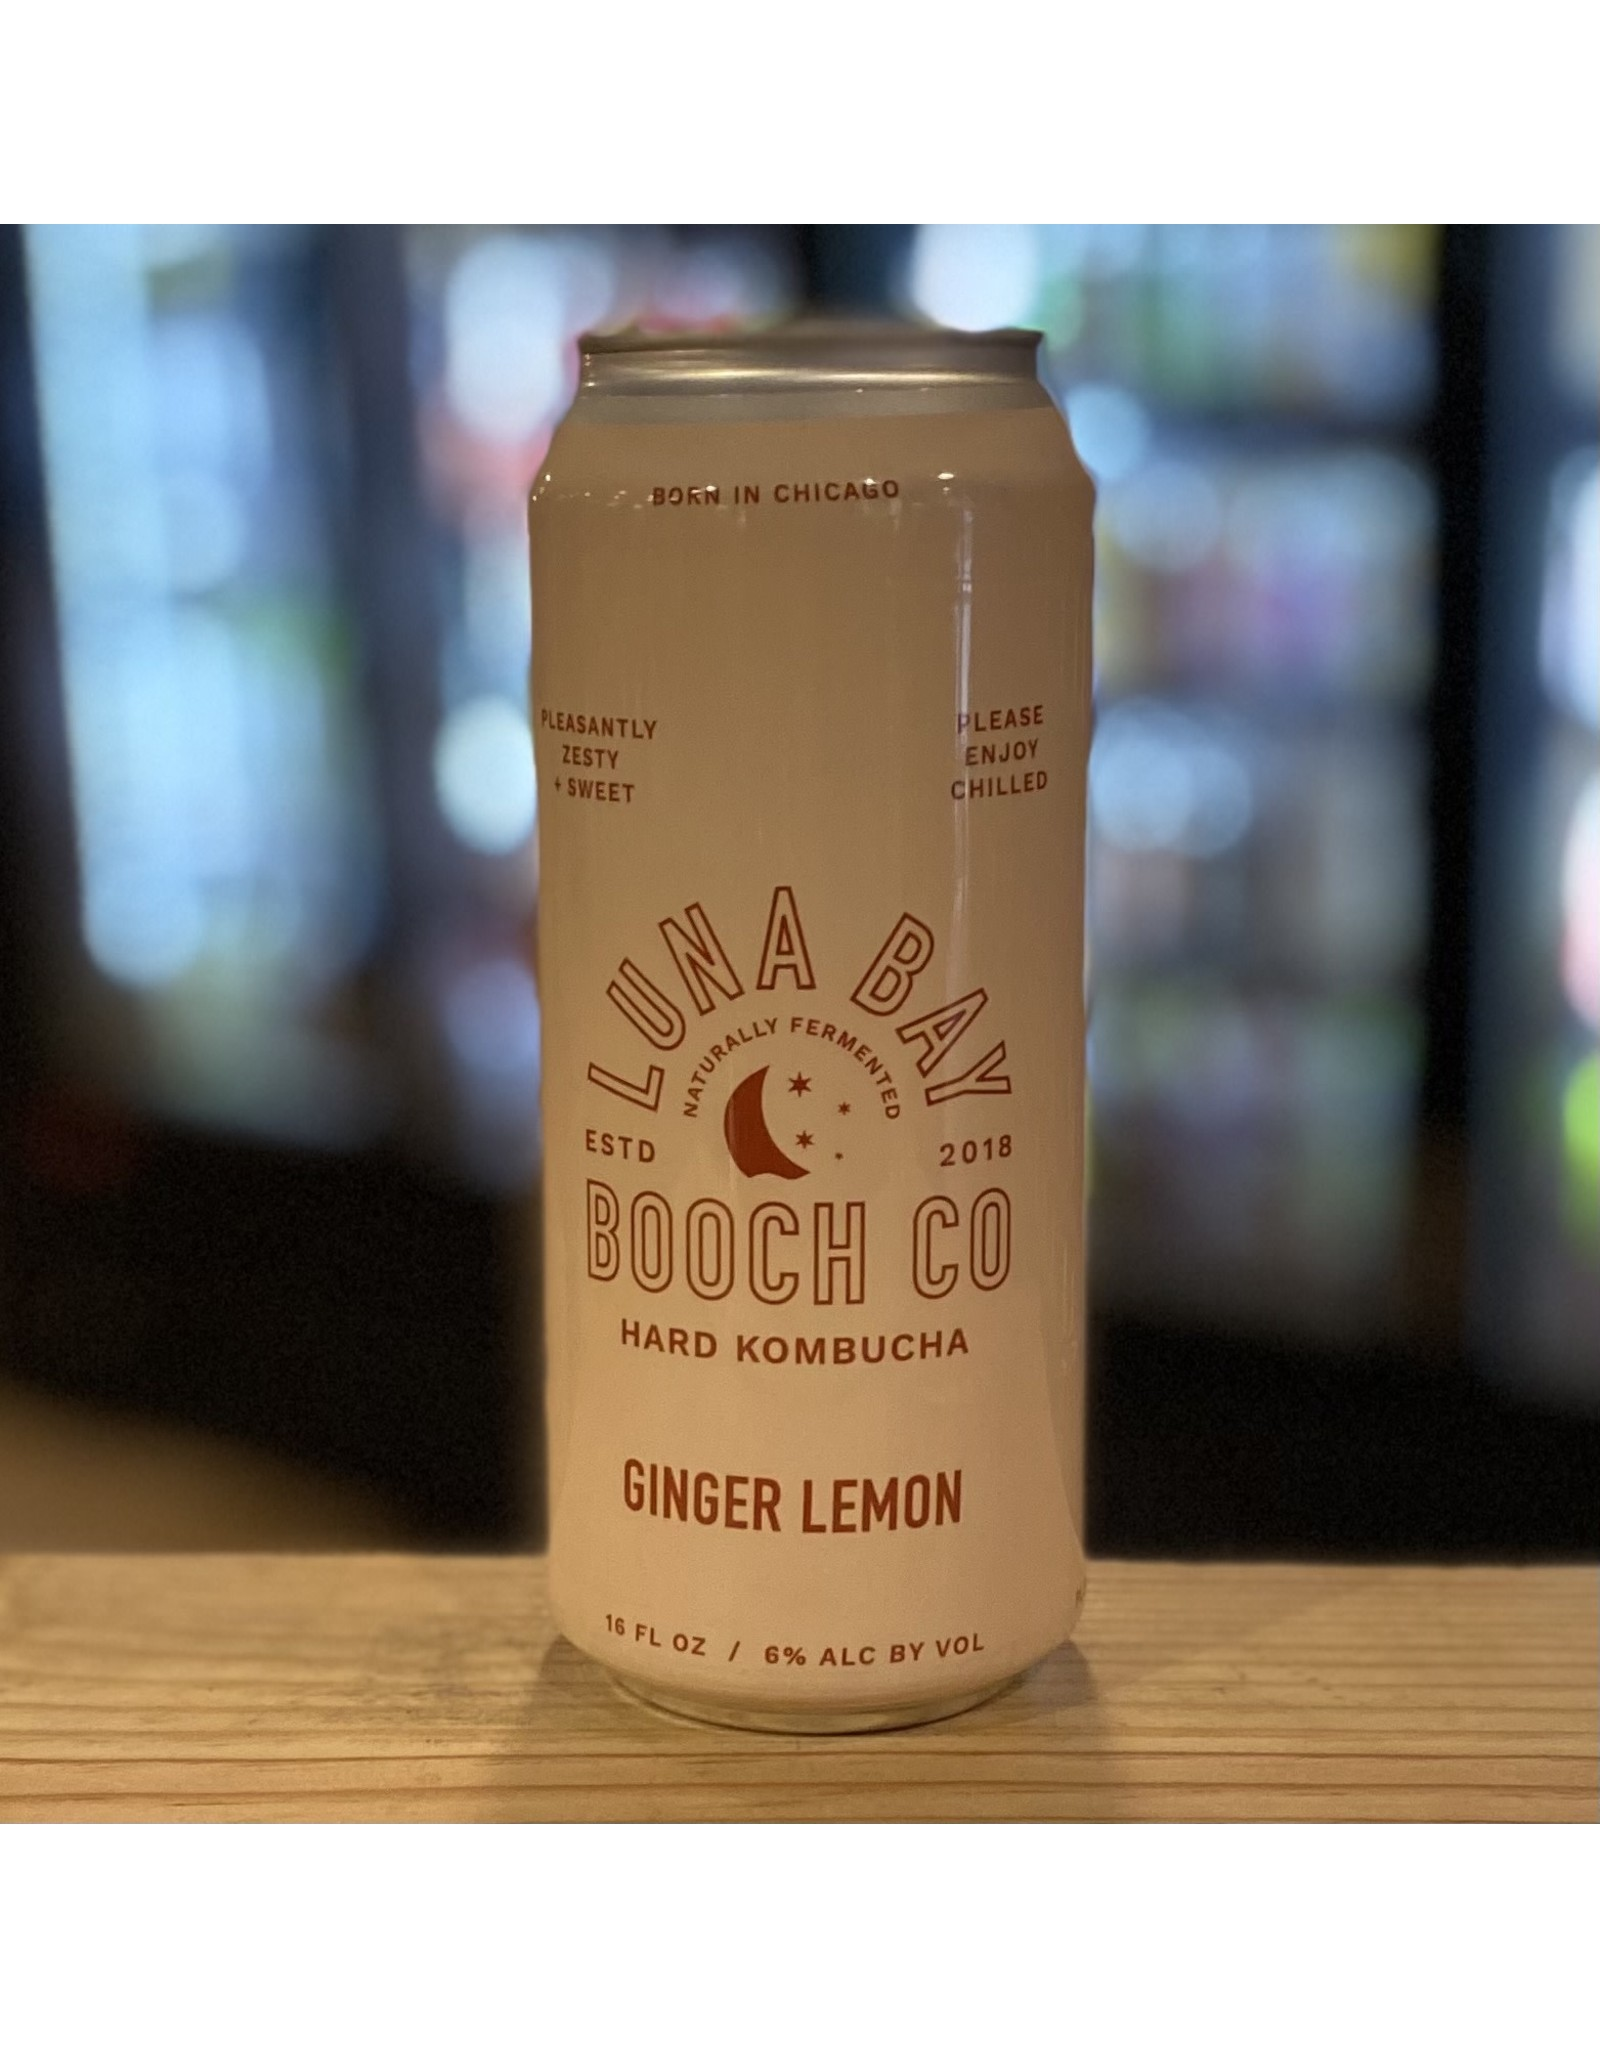 Luna Bay Booch Co Ginger Lemon Hard Kombucha - Denver, CO